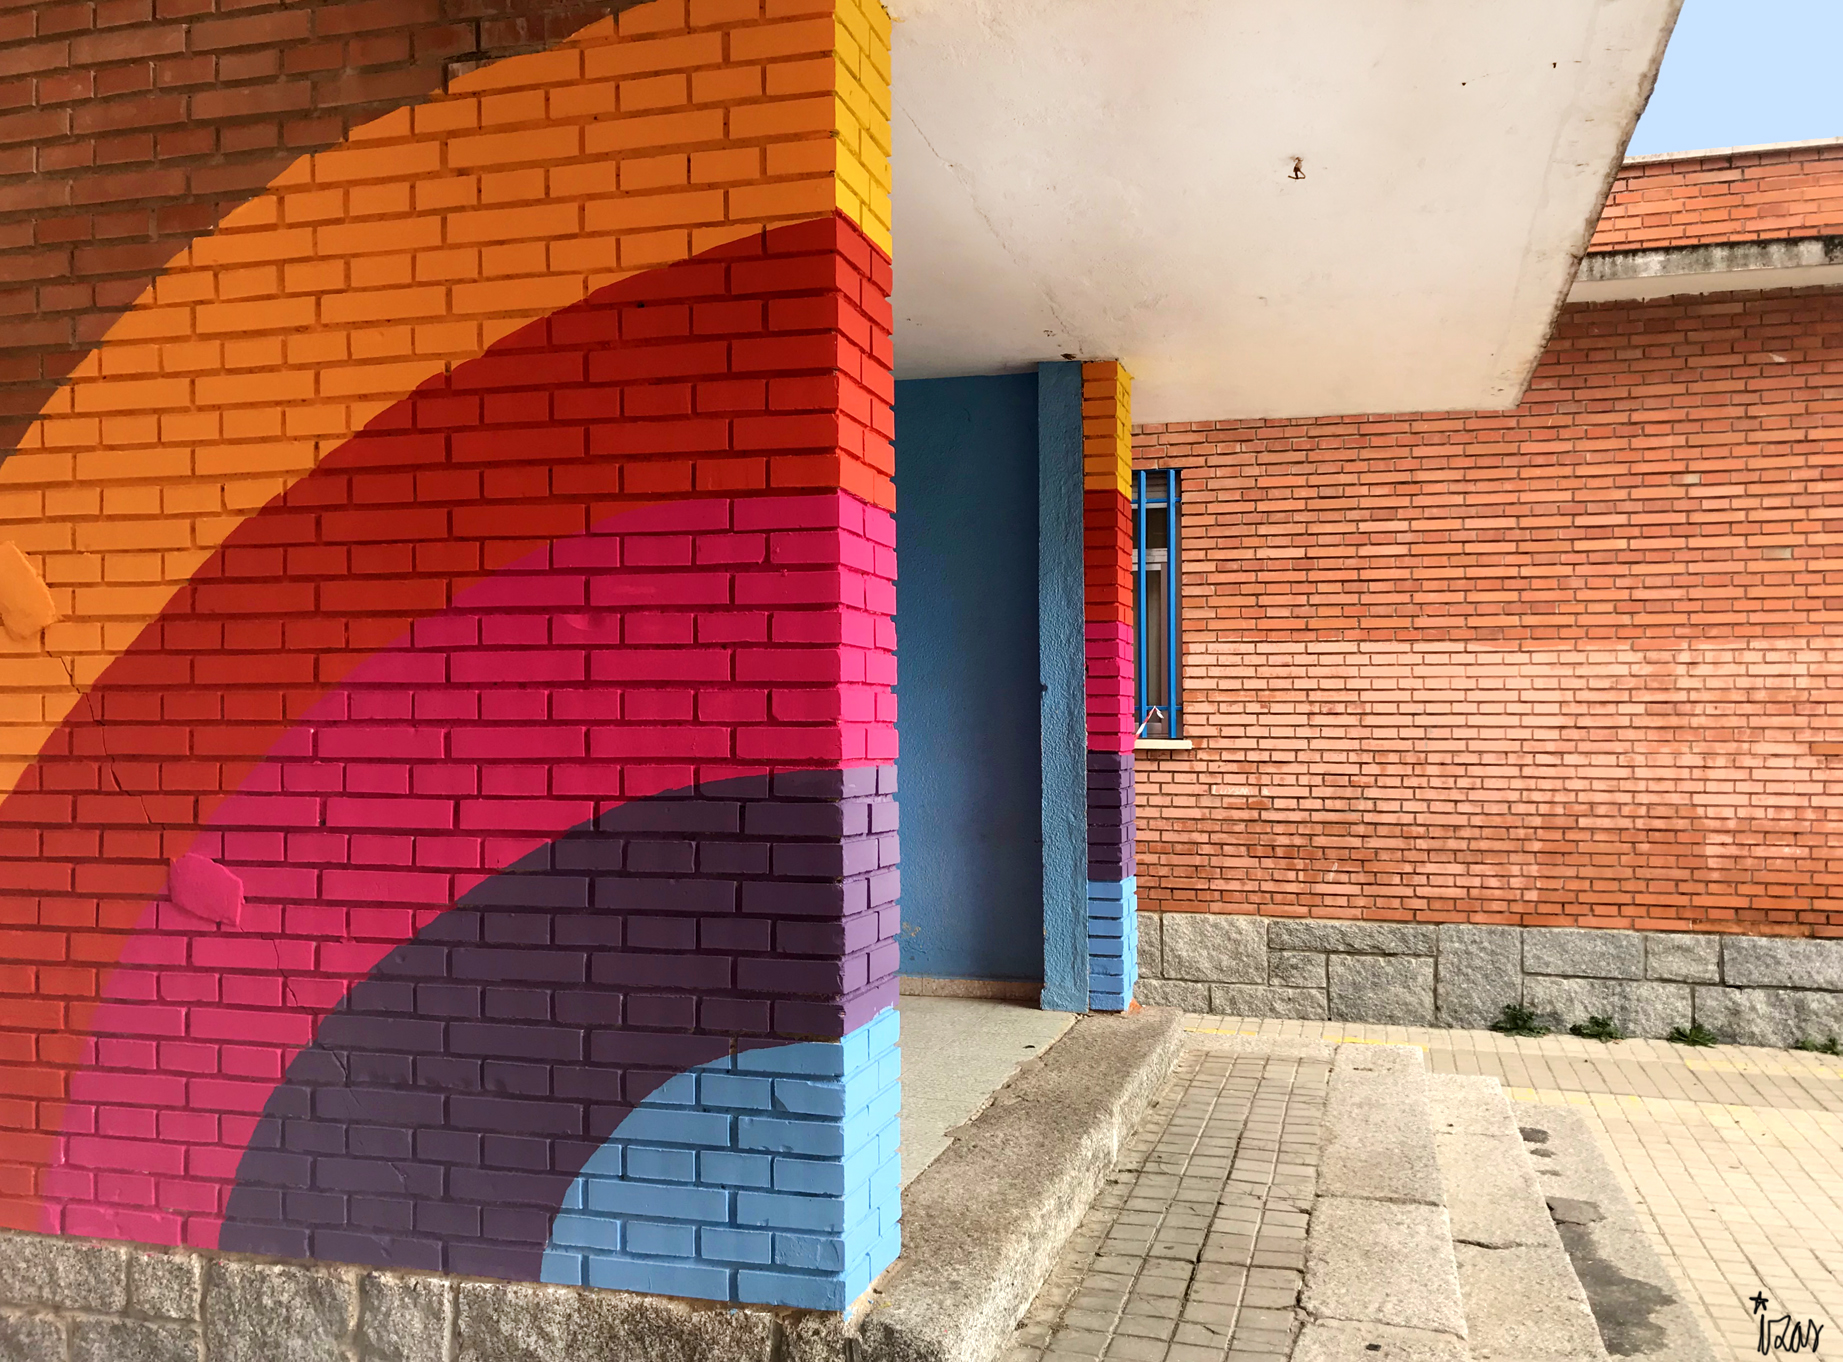 mural izas azulpatio ceip santo domingo entradas izquierda 2